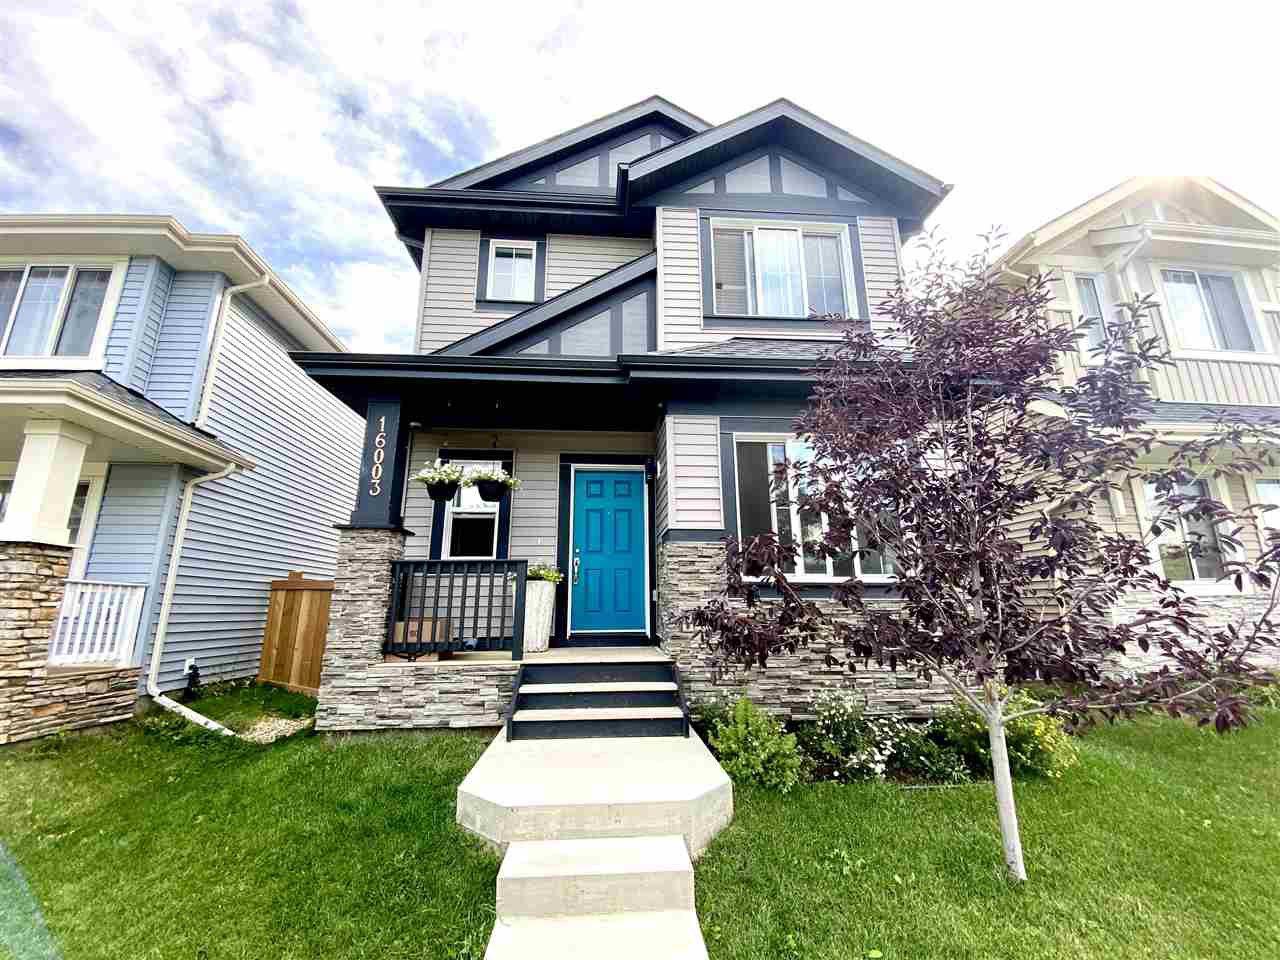 Main Photo: 16003 13 Avenue in Edmonton: Zone 56 House for sale : MLS®# E4212087